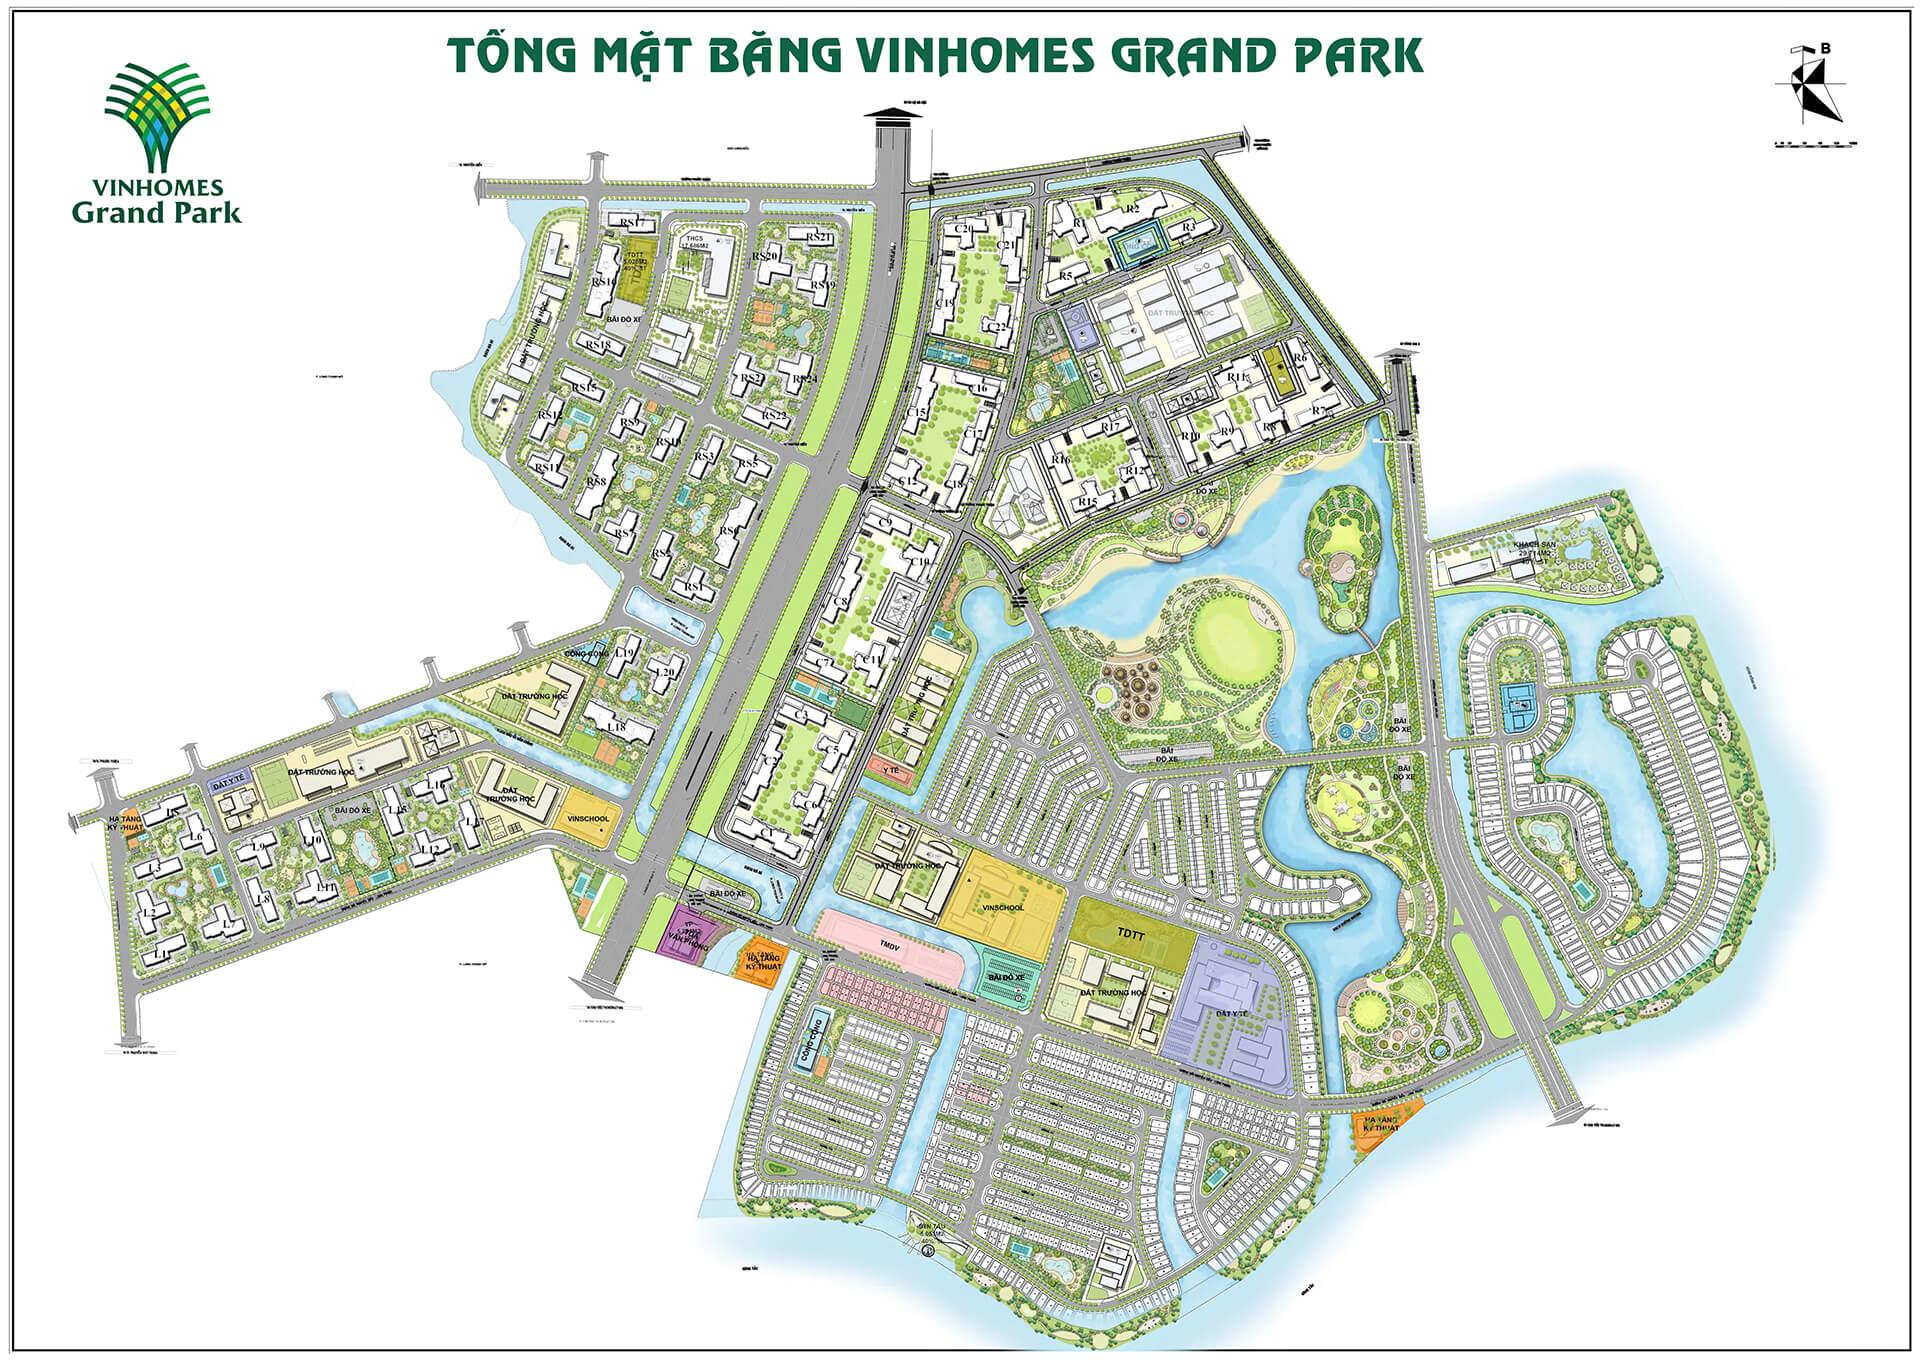 tong-mat-bang-vinhome-grand-park